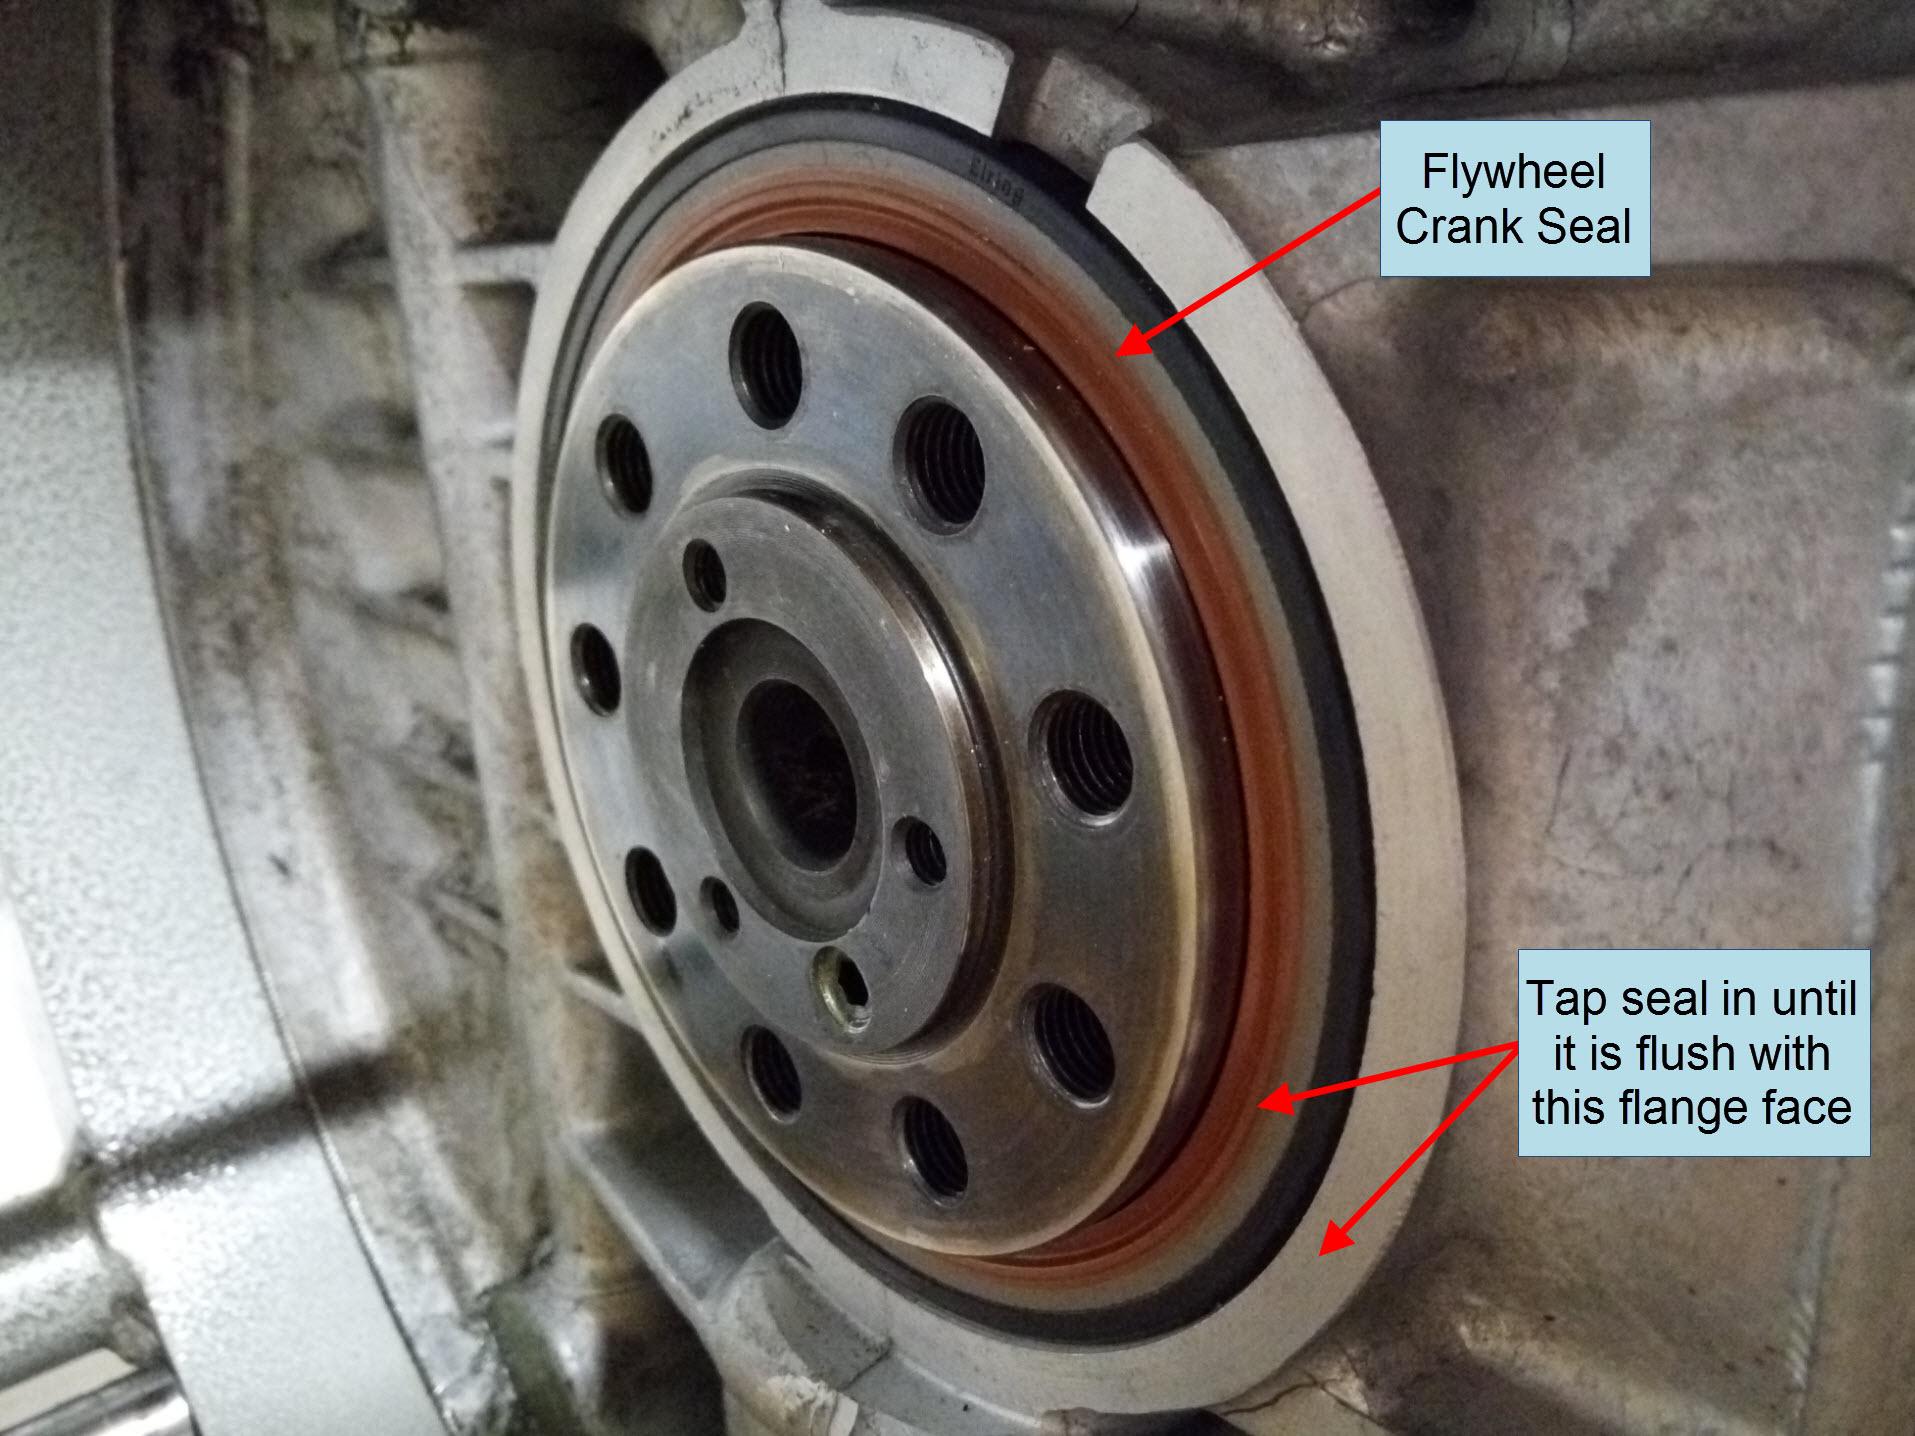 Air-cooled Porsche 911 flywheel crank seal installation.